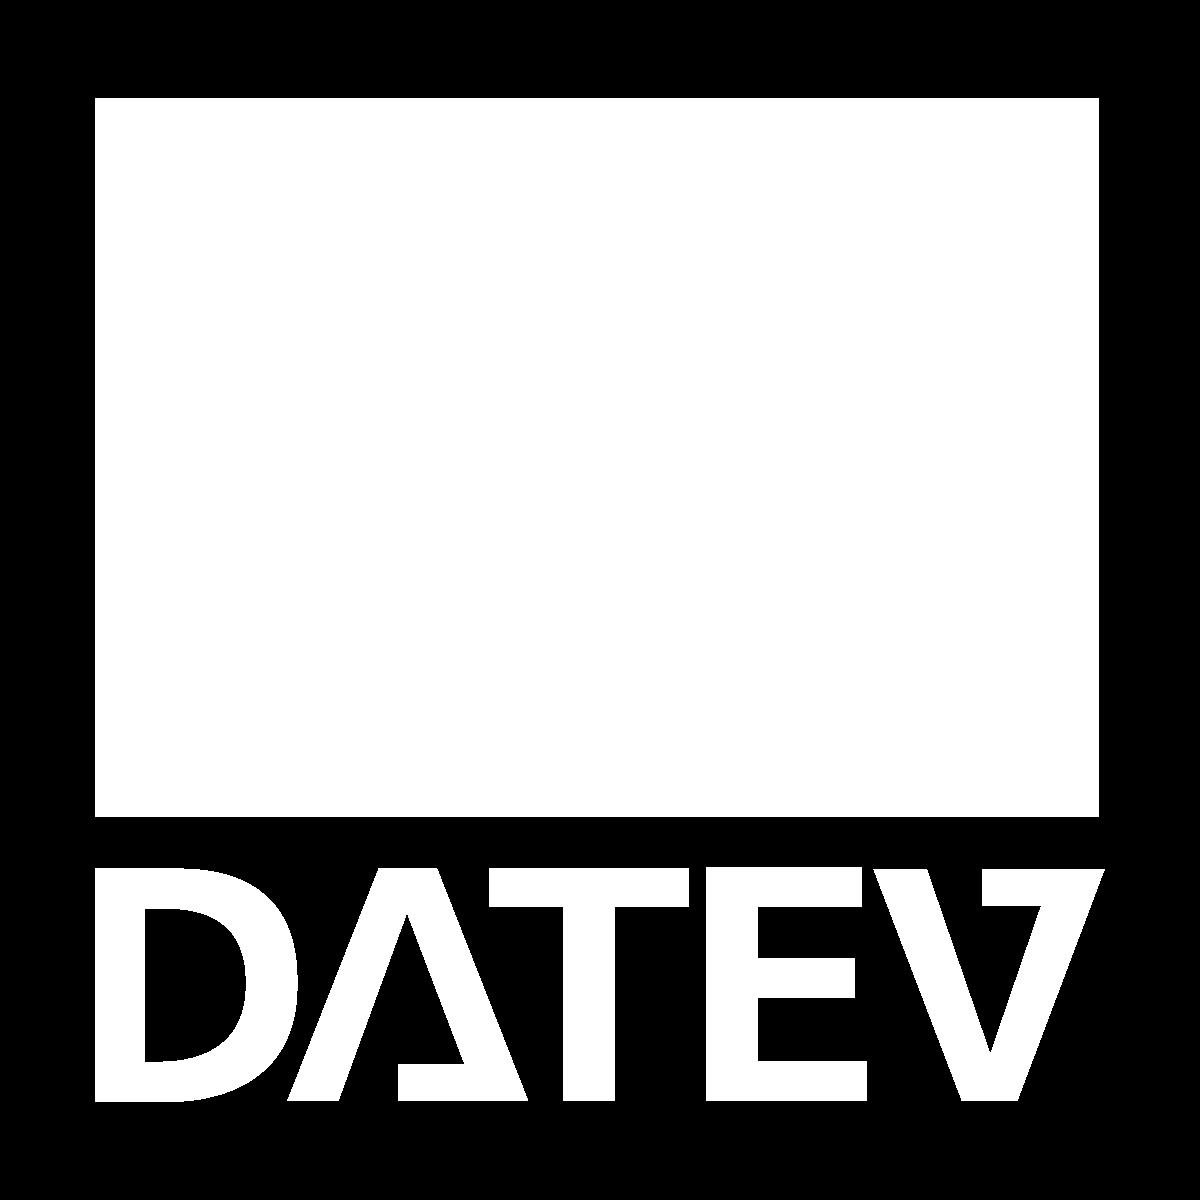 datevcloud software download